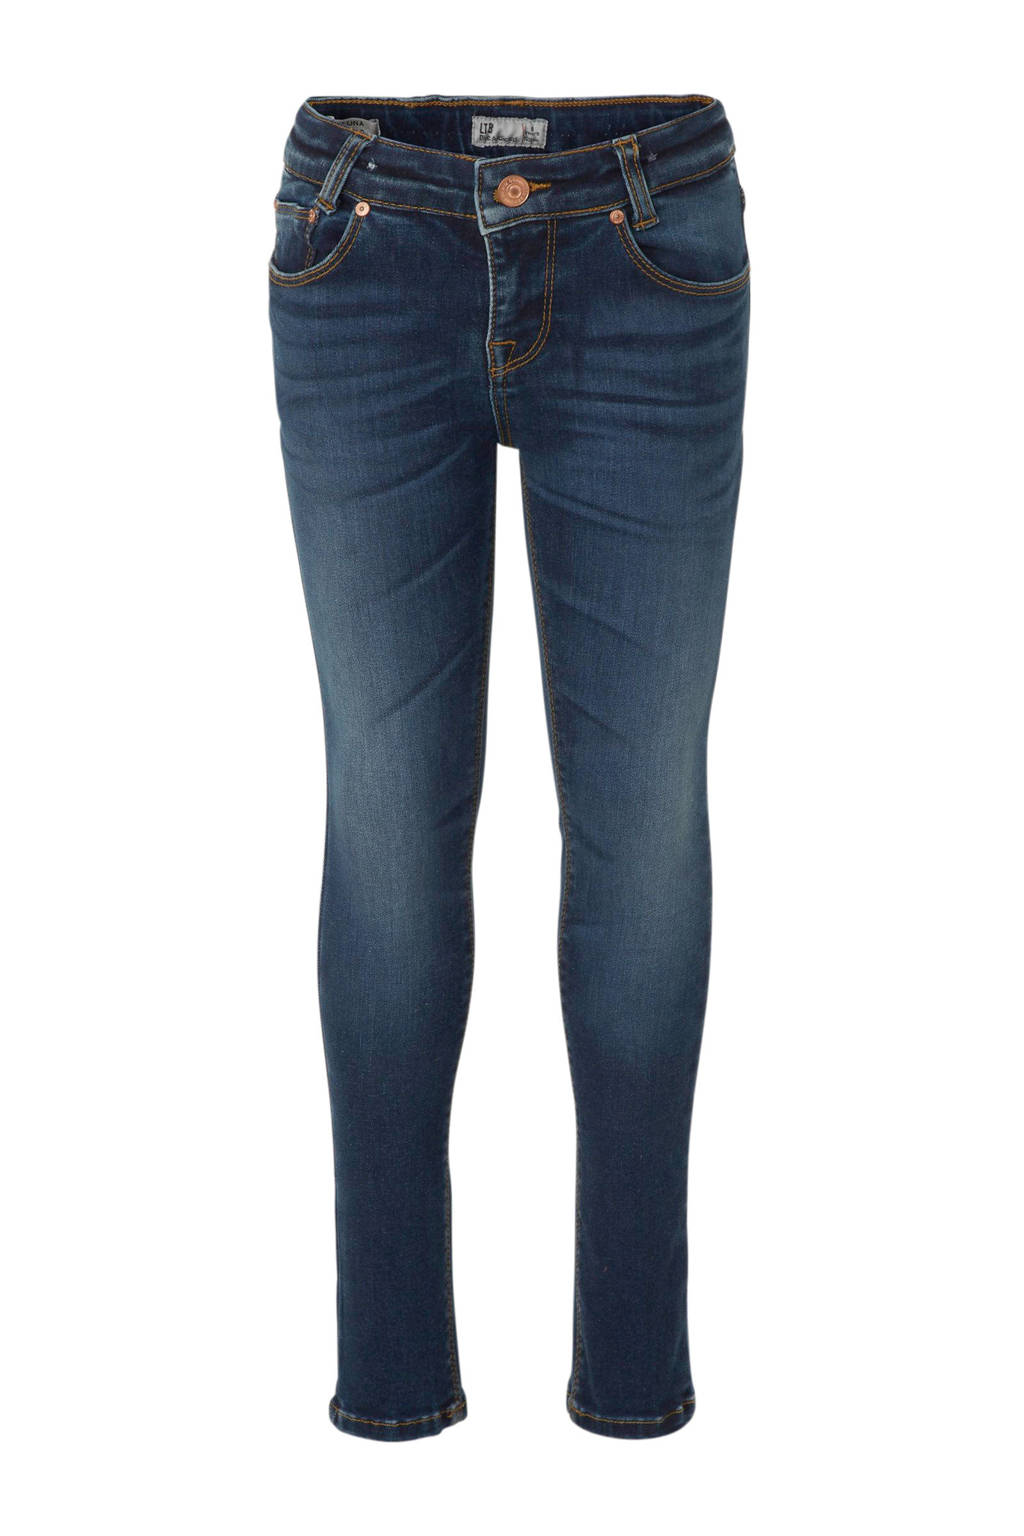 LTB skinny jeans Luna, Donkerblauw (Muly wash)